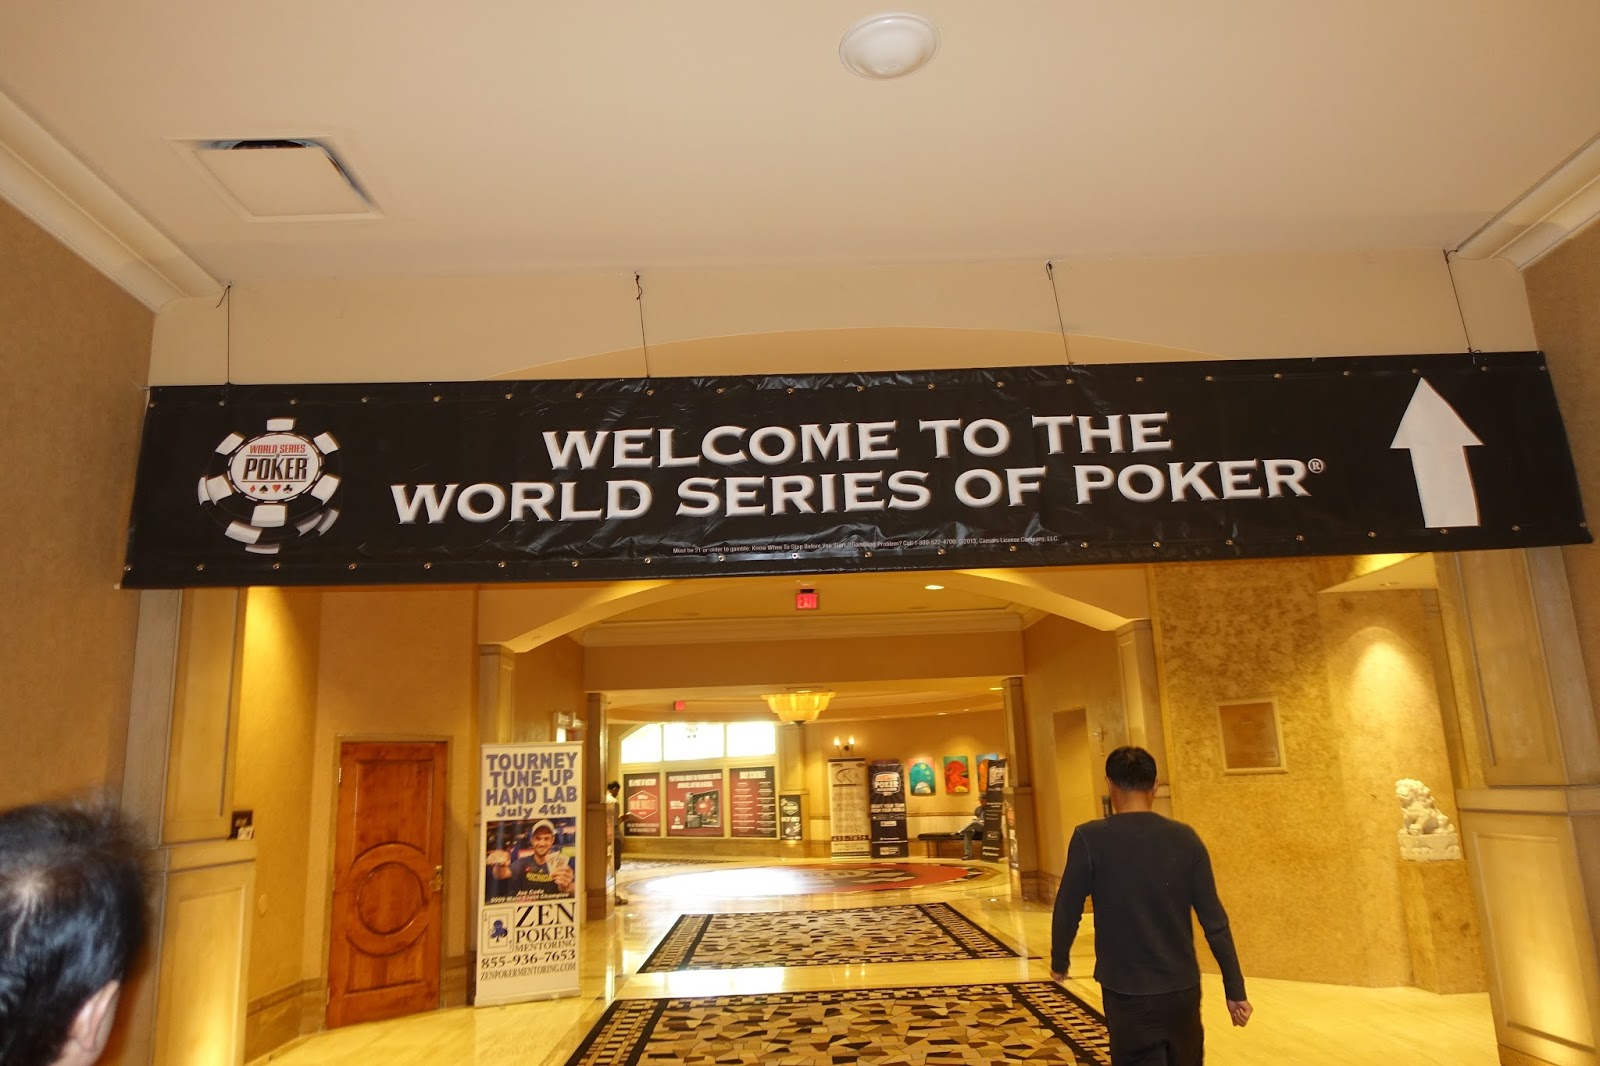 Avi Rubin's Blog: My WSOP Main Event Experience